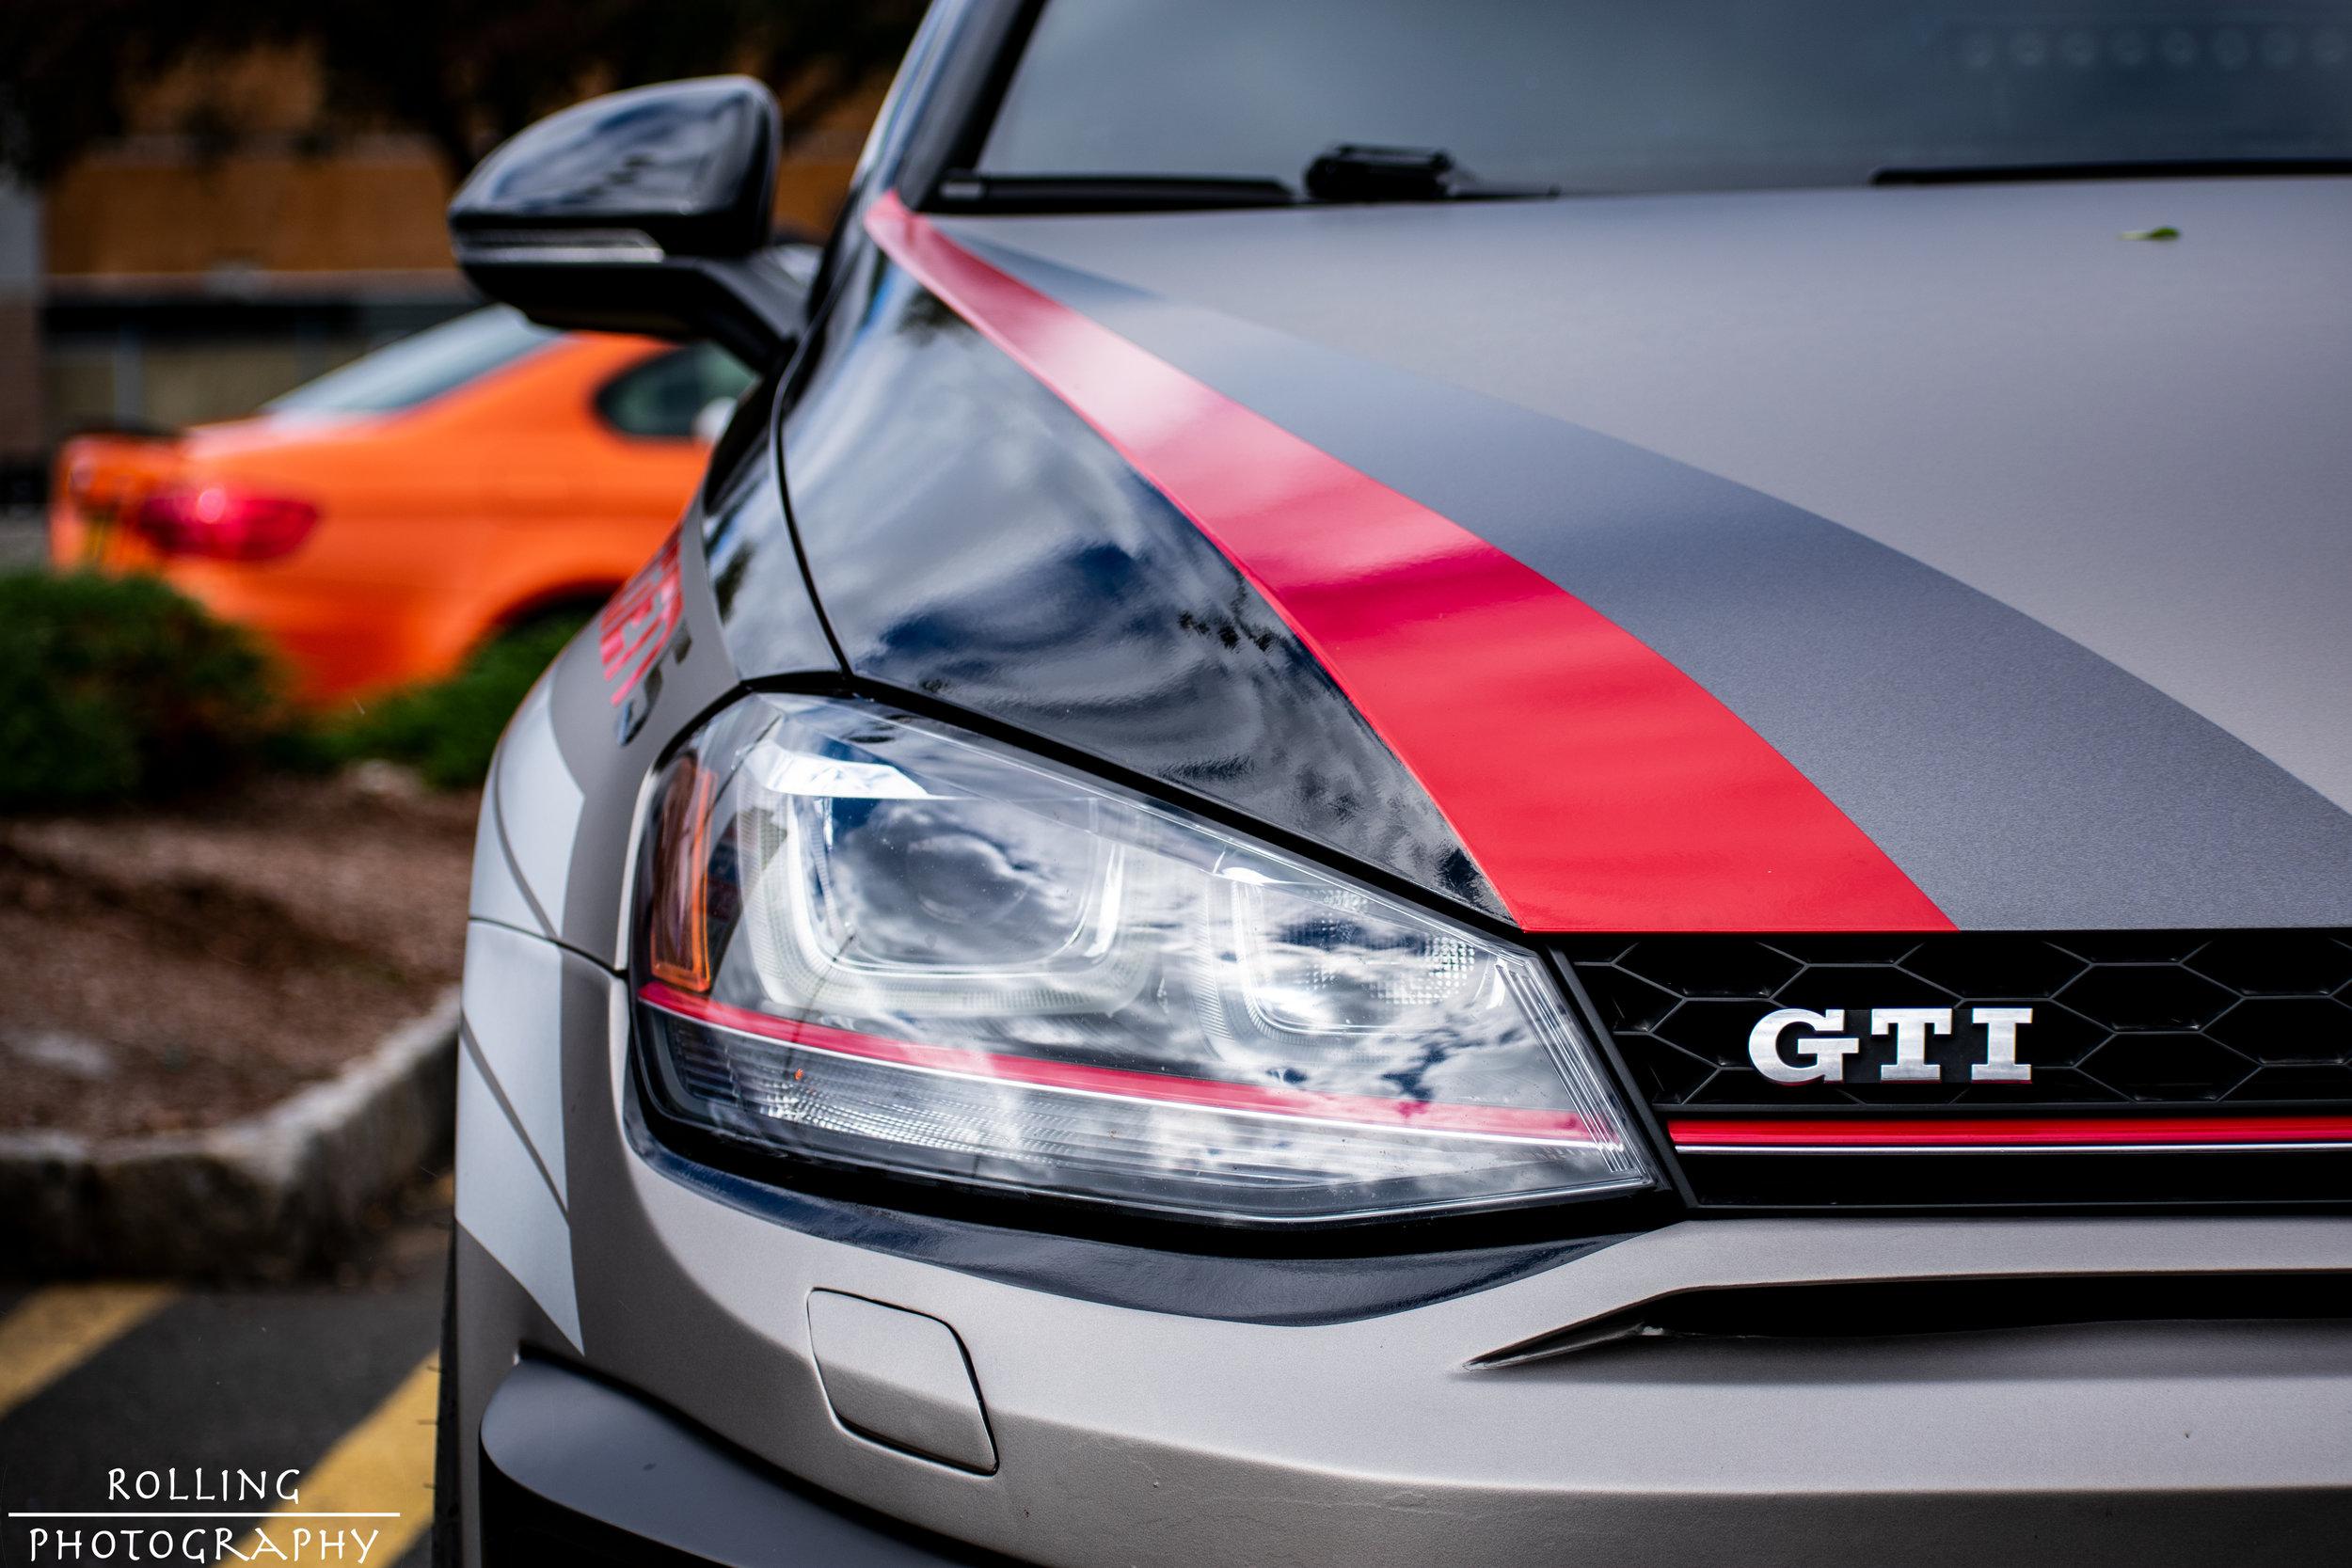 The Black GT MK7 Close-up Edit.jpg